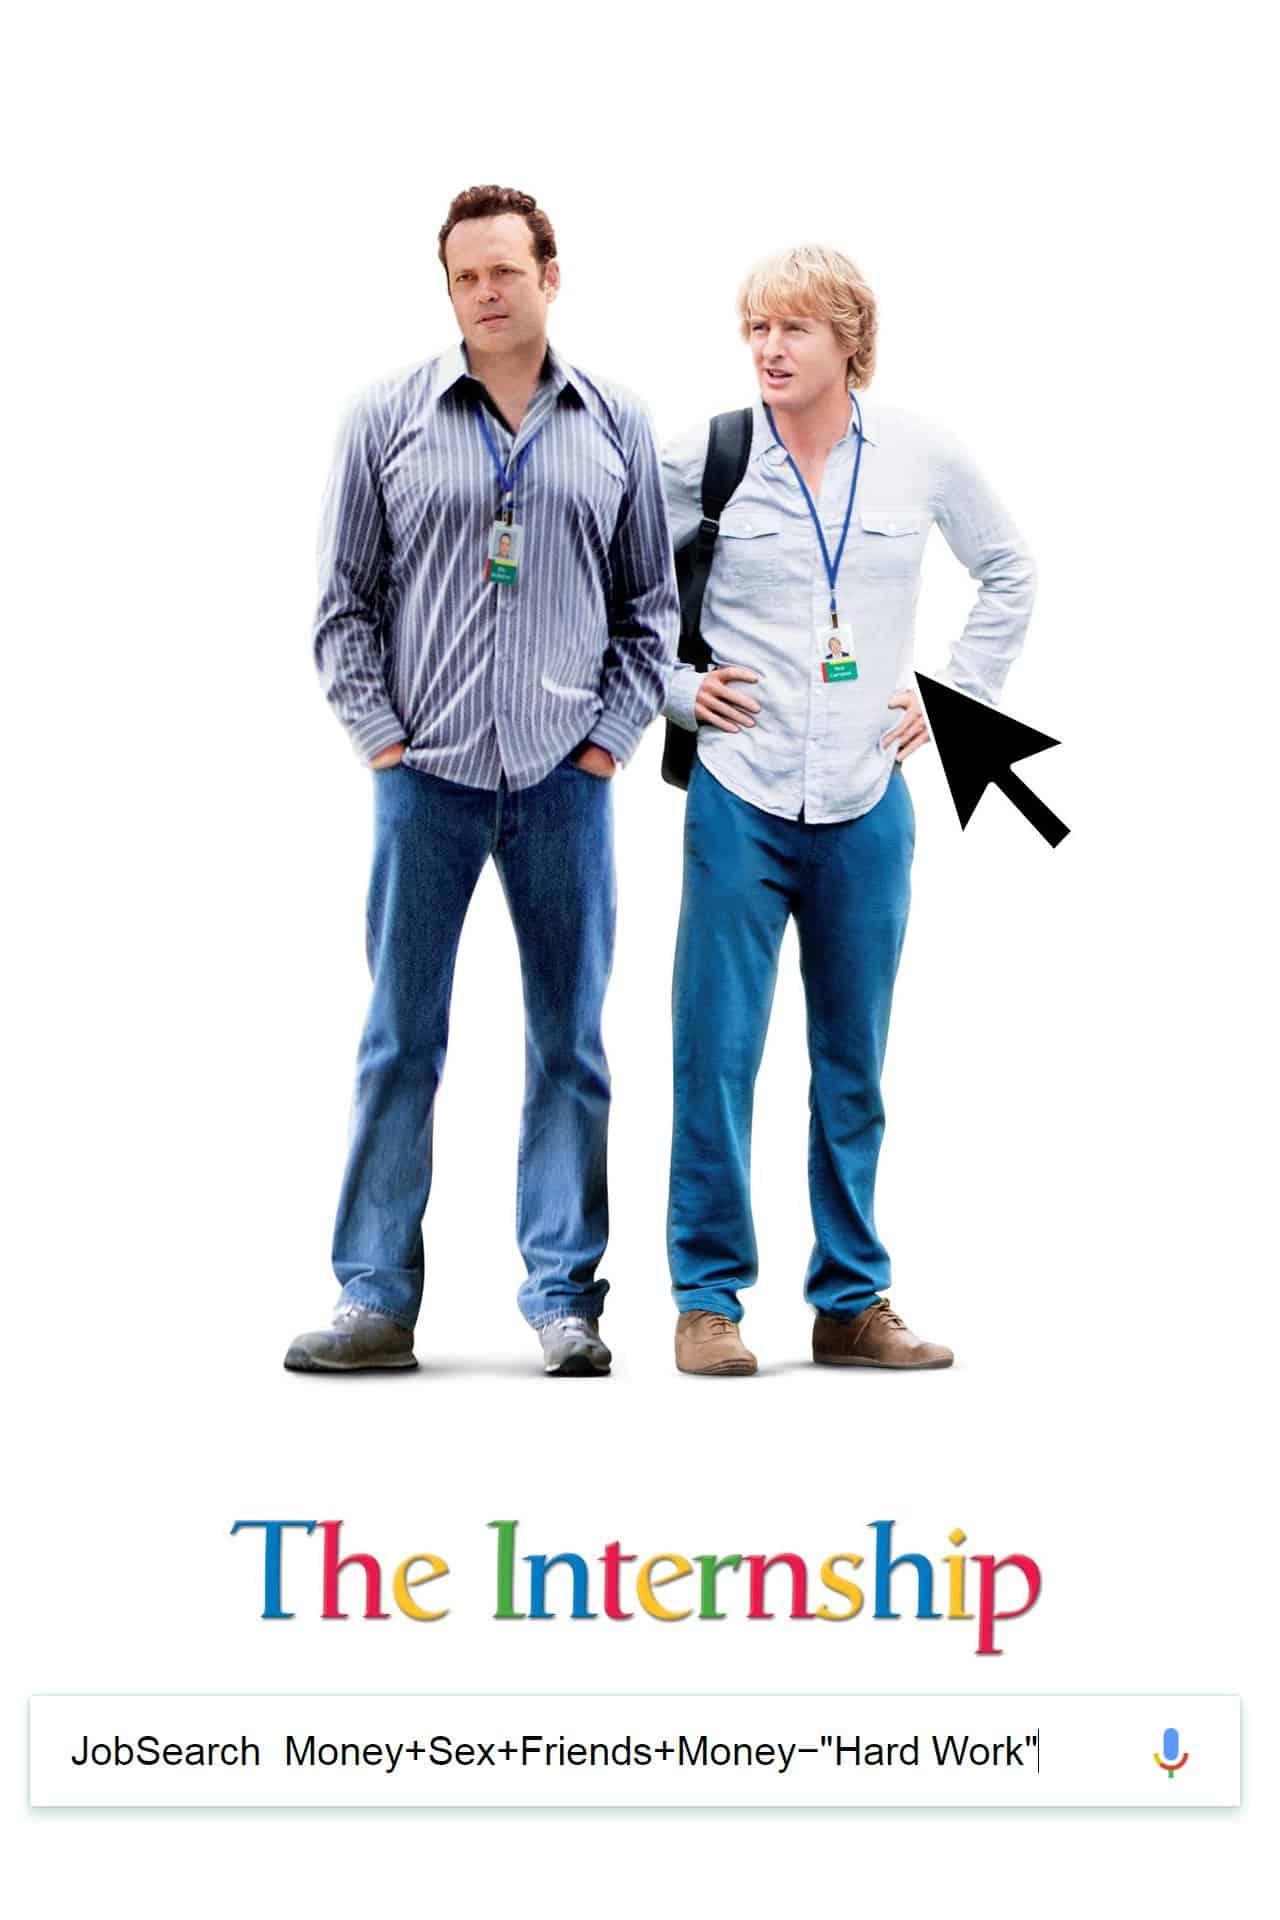 The Internship, 2013